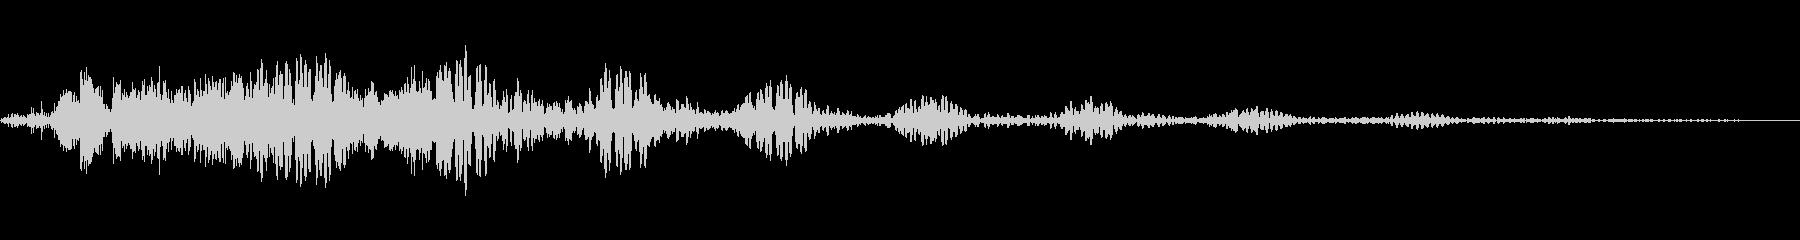 SciFi EC01_82_2の未再生の波形